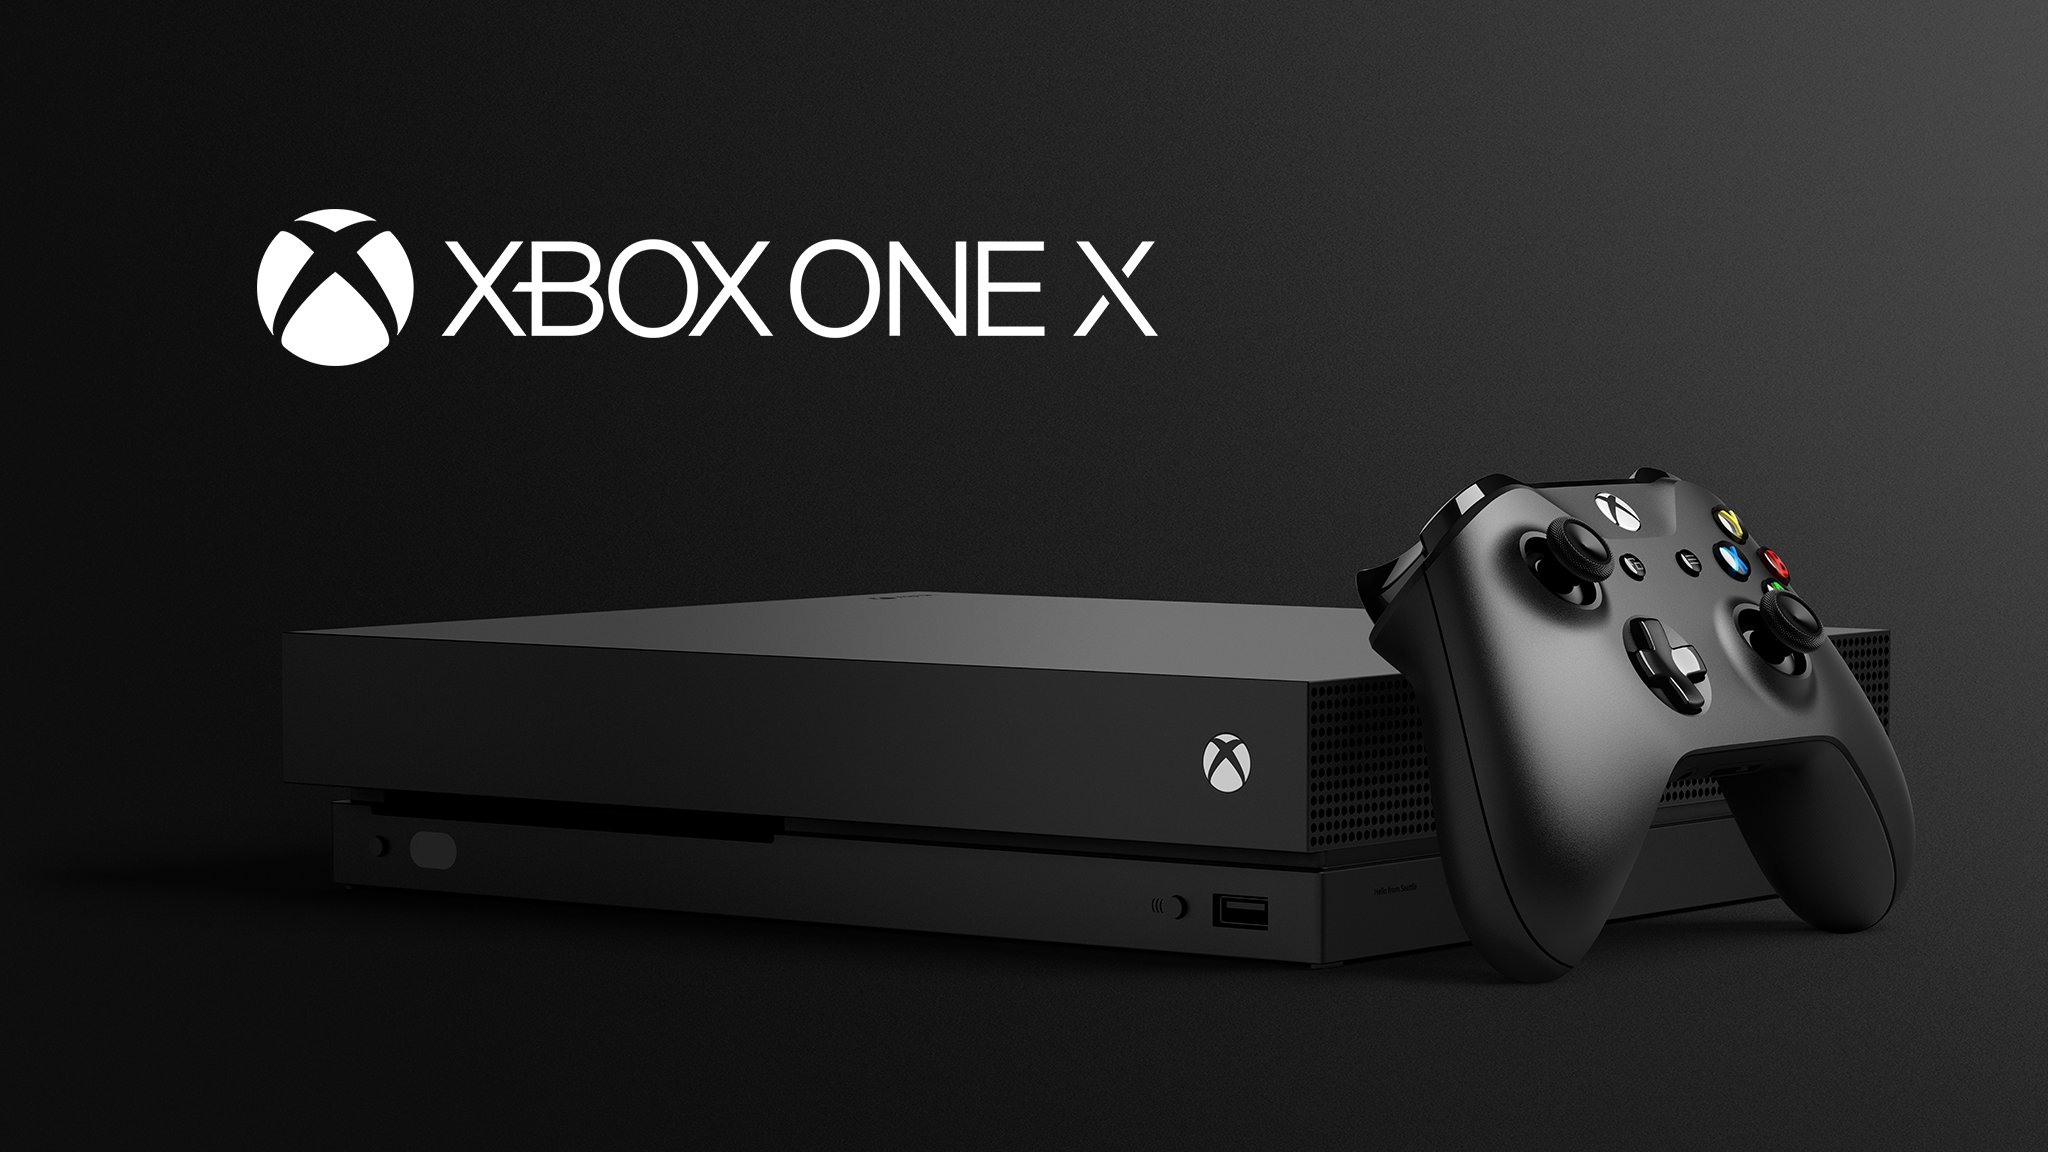 Купить Xbox One X в Симферополе Икс Бокс Ван Икс